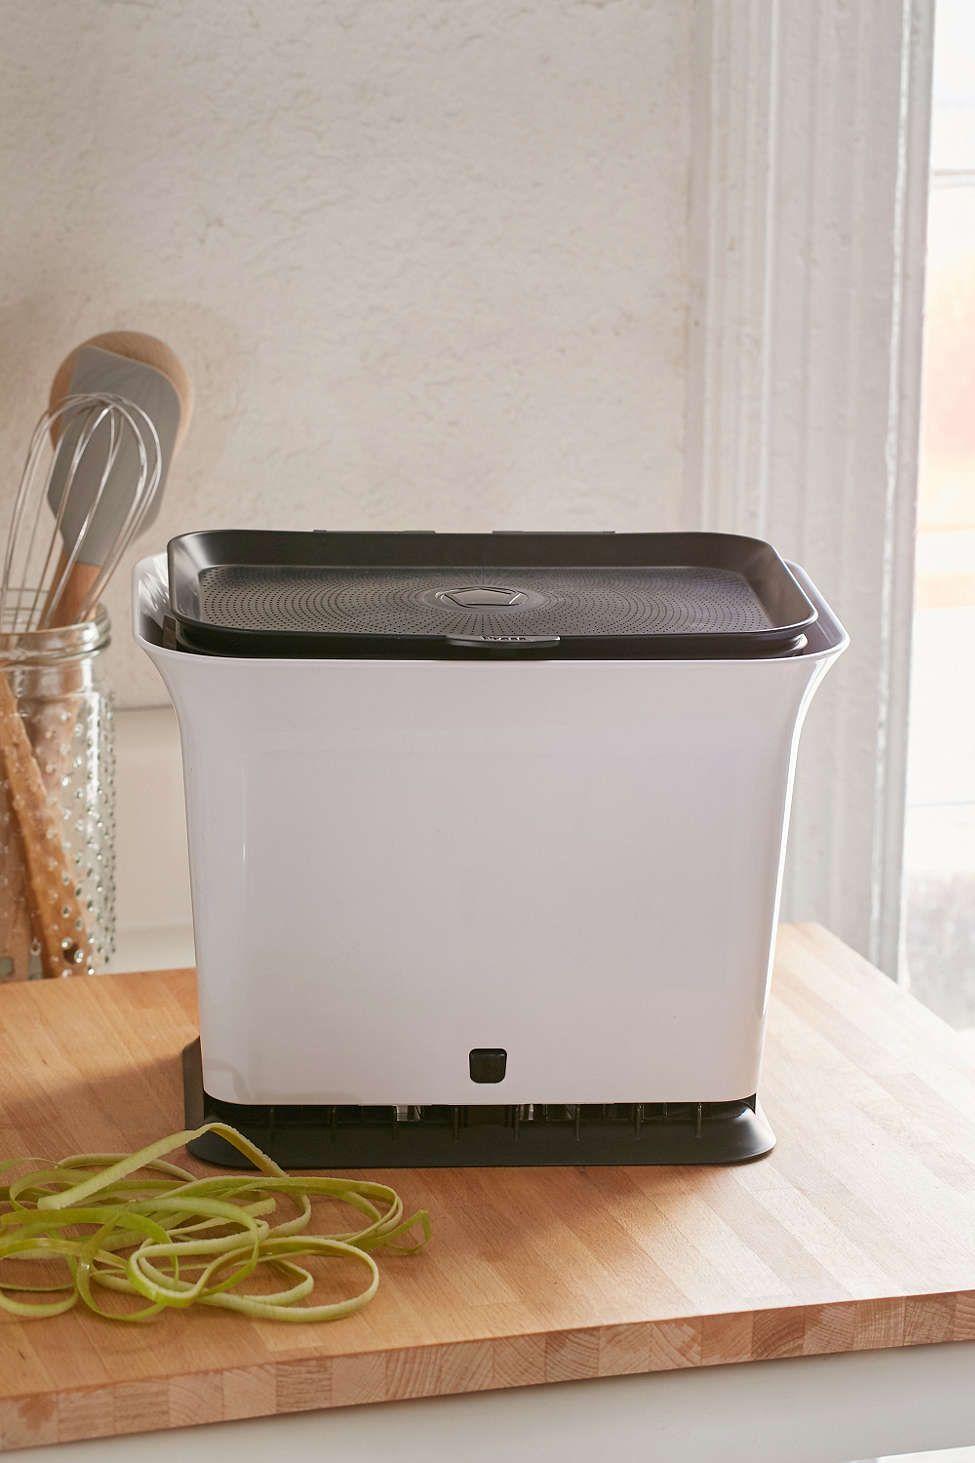 Full circle fresh air odorfree kitchen composting bin